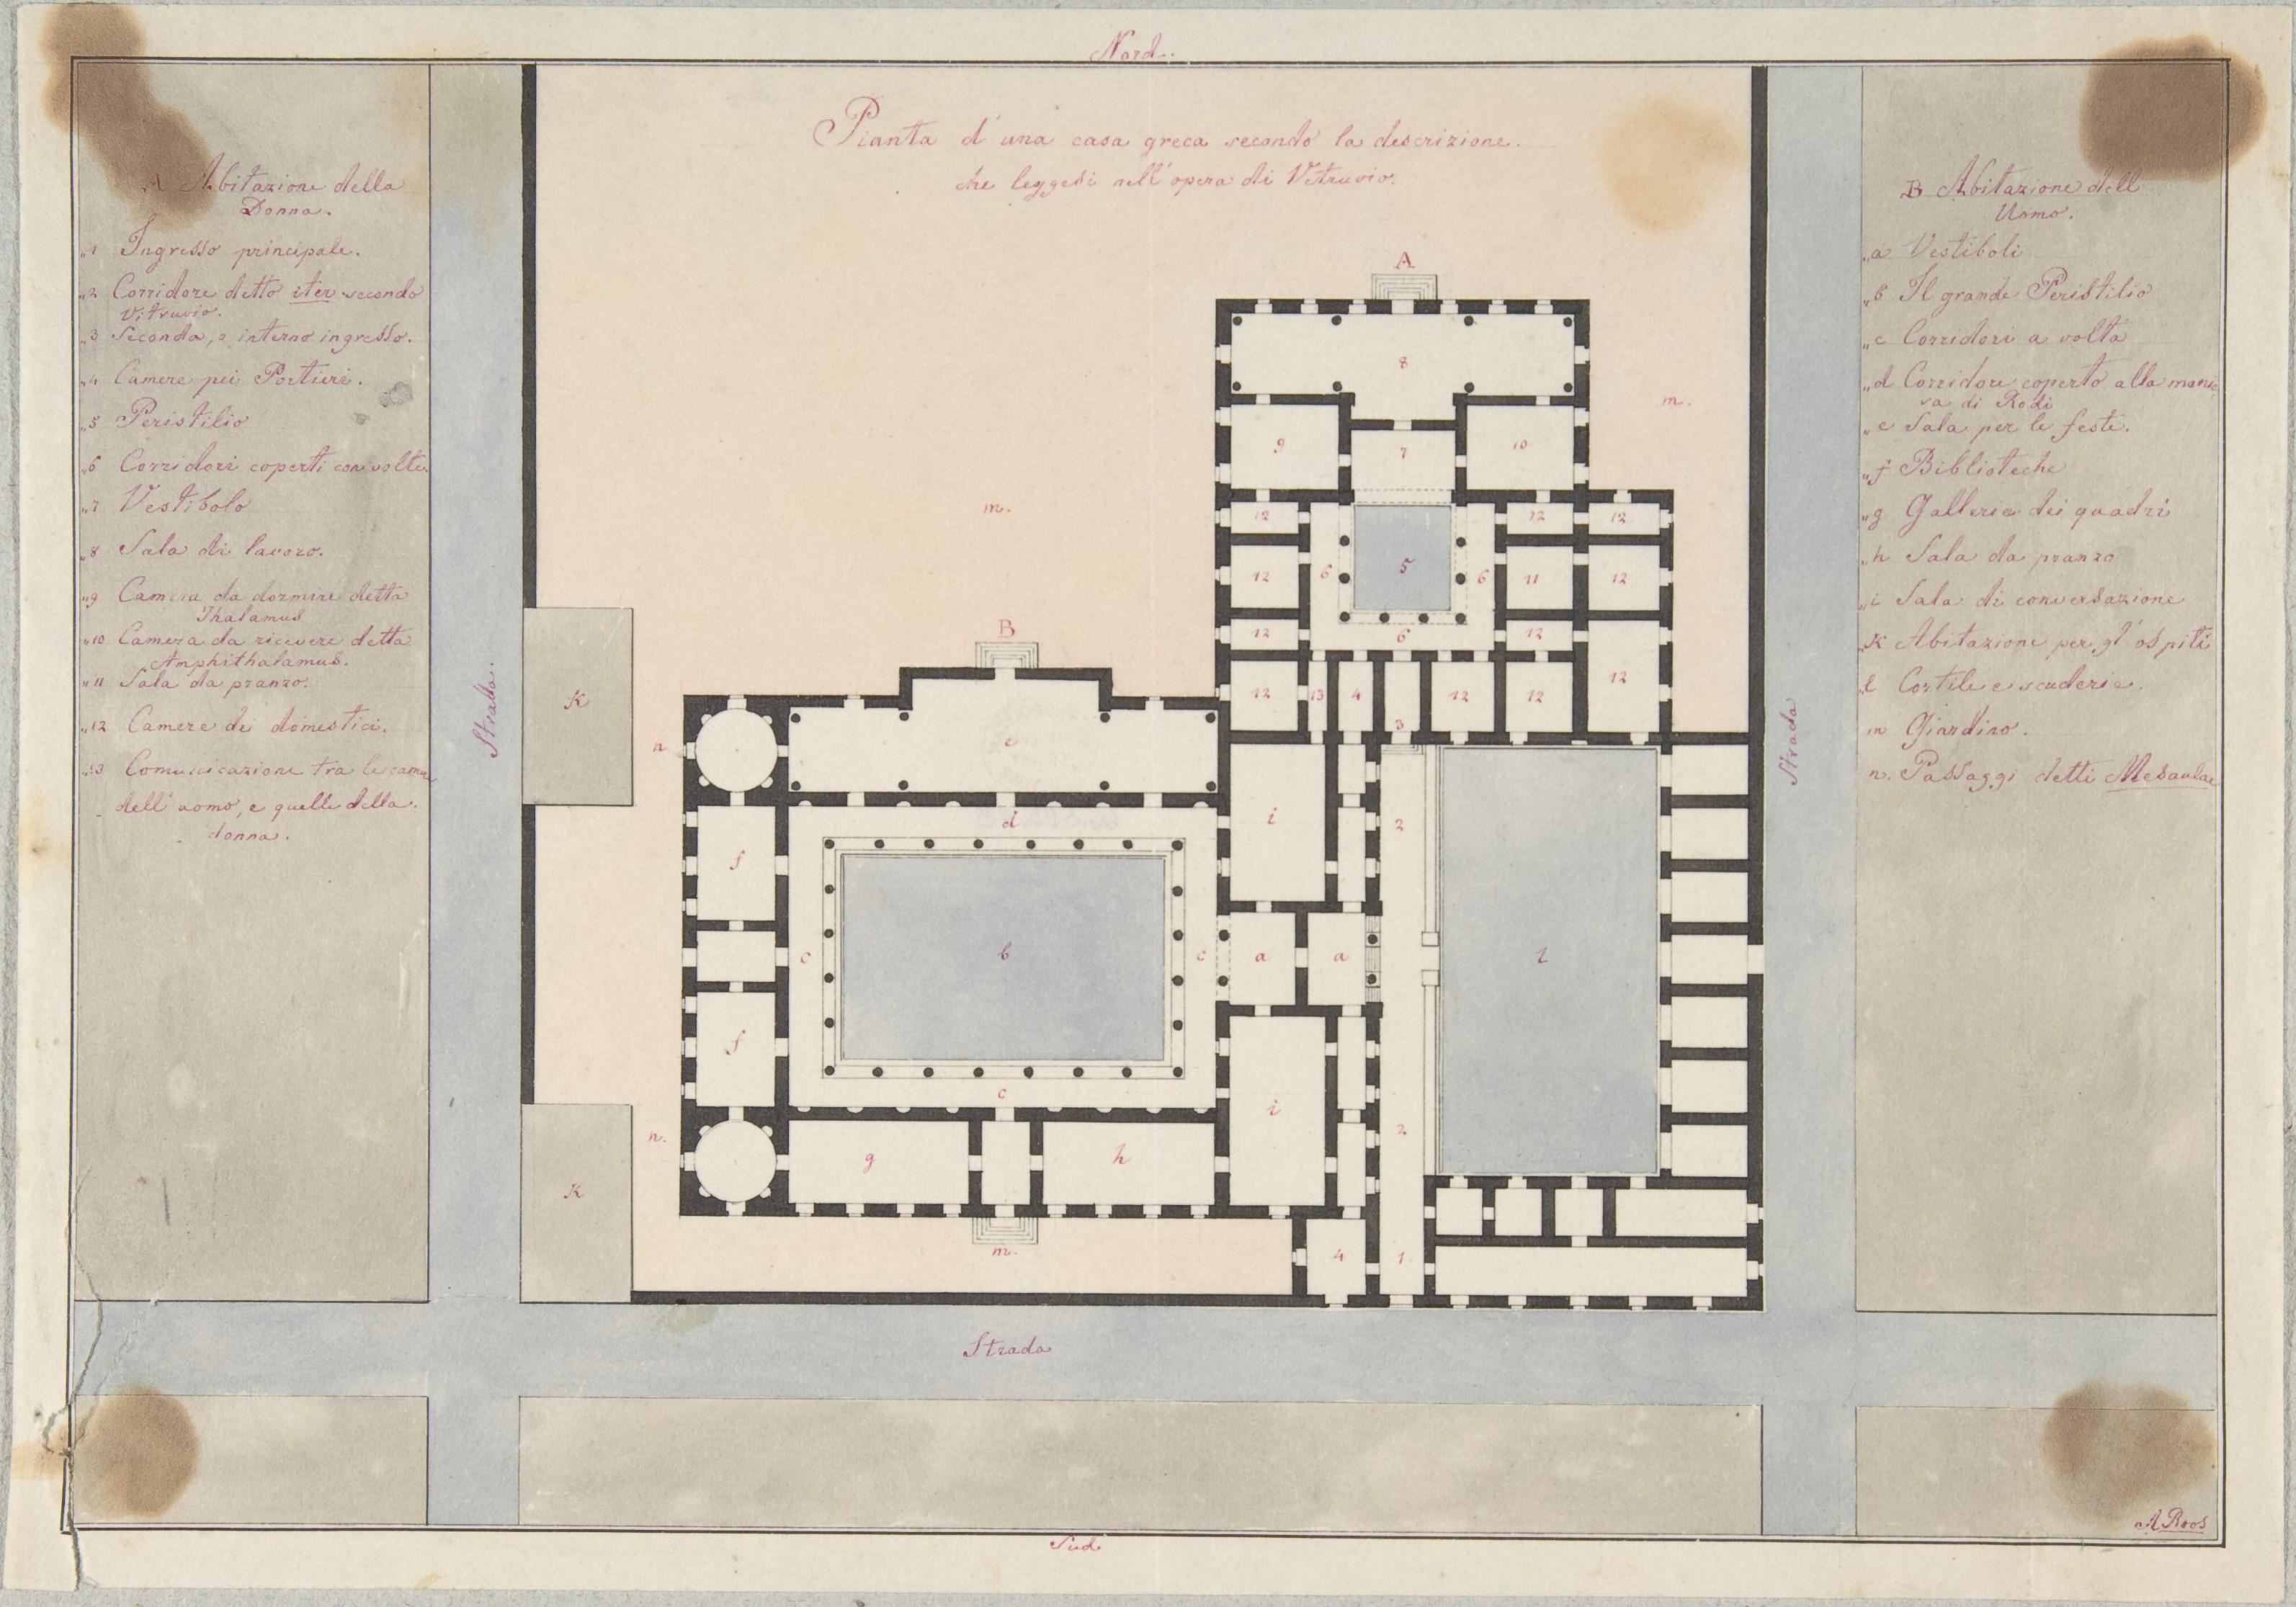 Quadri Per Sala Da Pranzo file:plan of a greek house met dp803957 - wikimedia commons